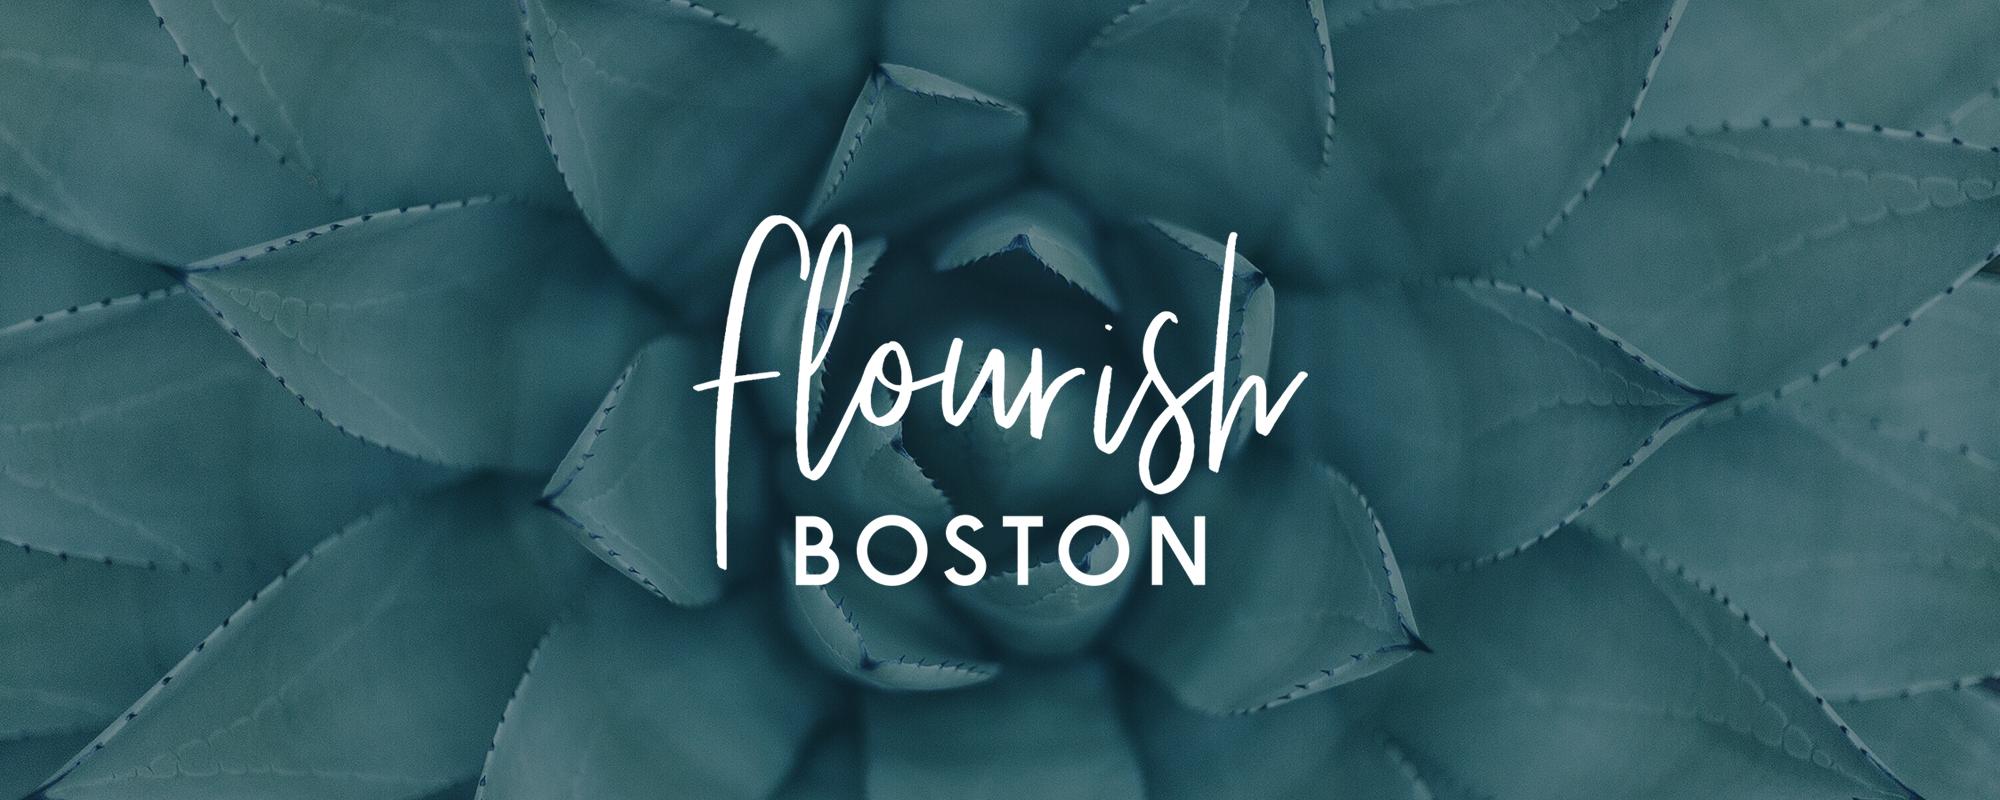 FlourishBoston-Horizontal.jpg